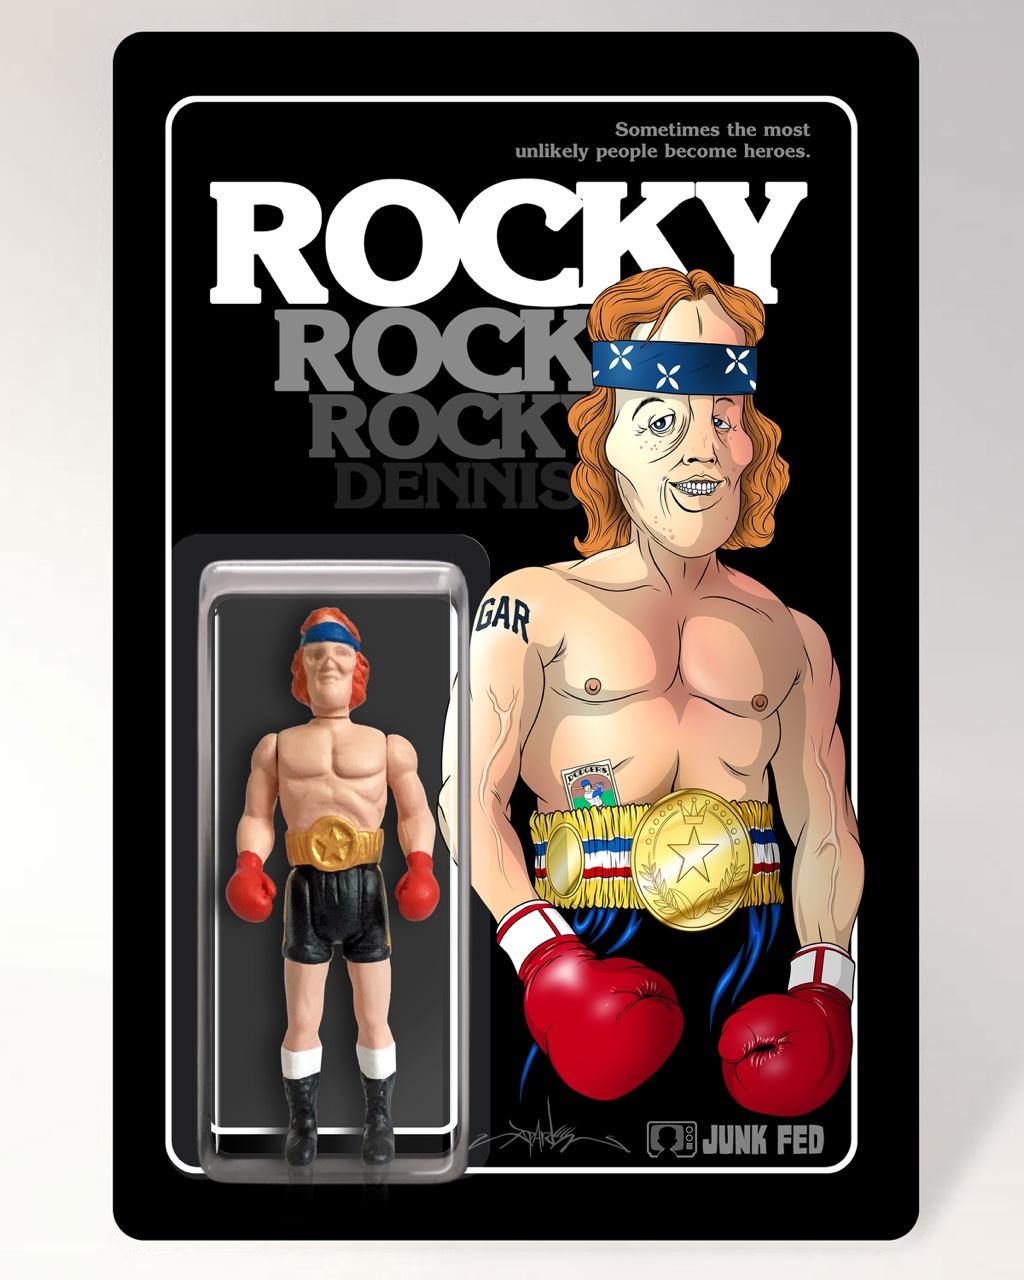 Rocky Dennis 2